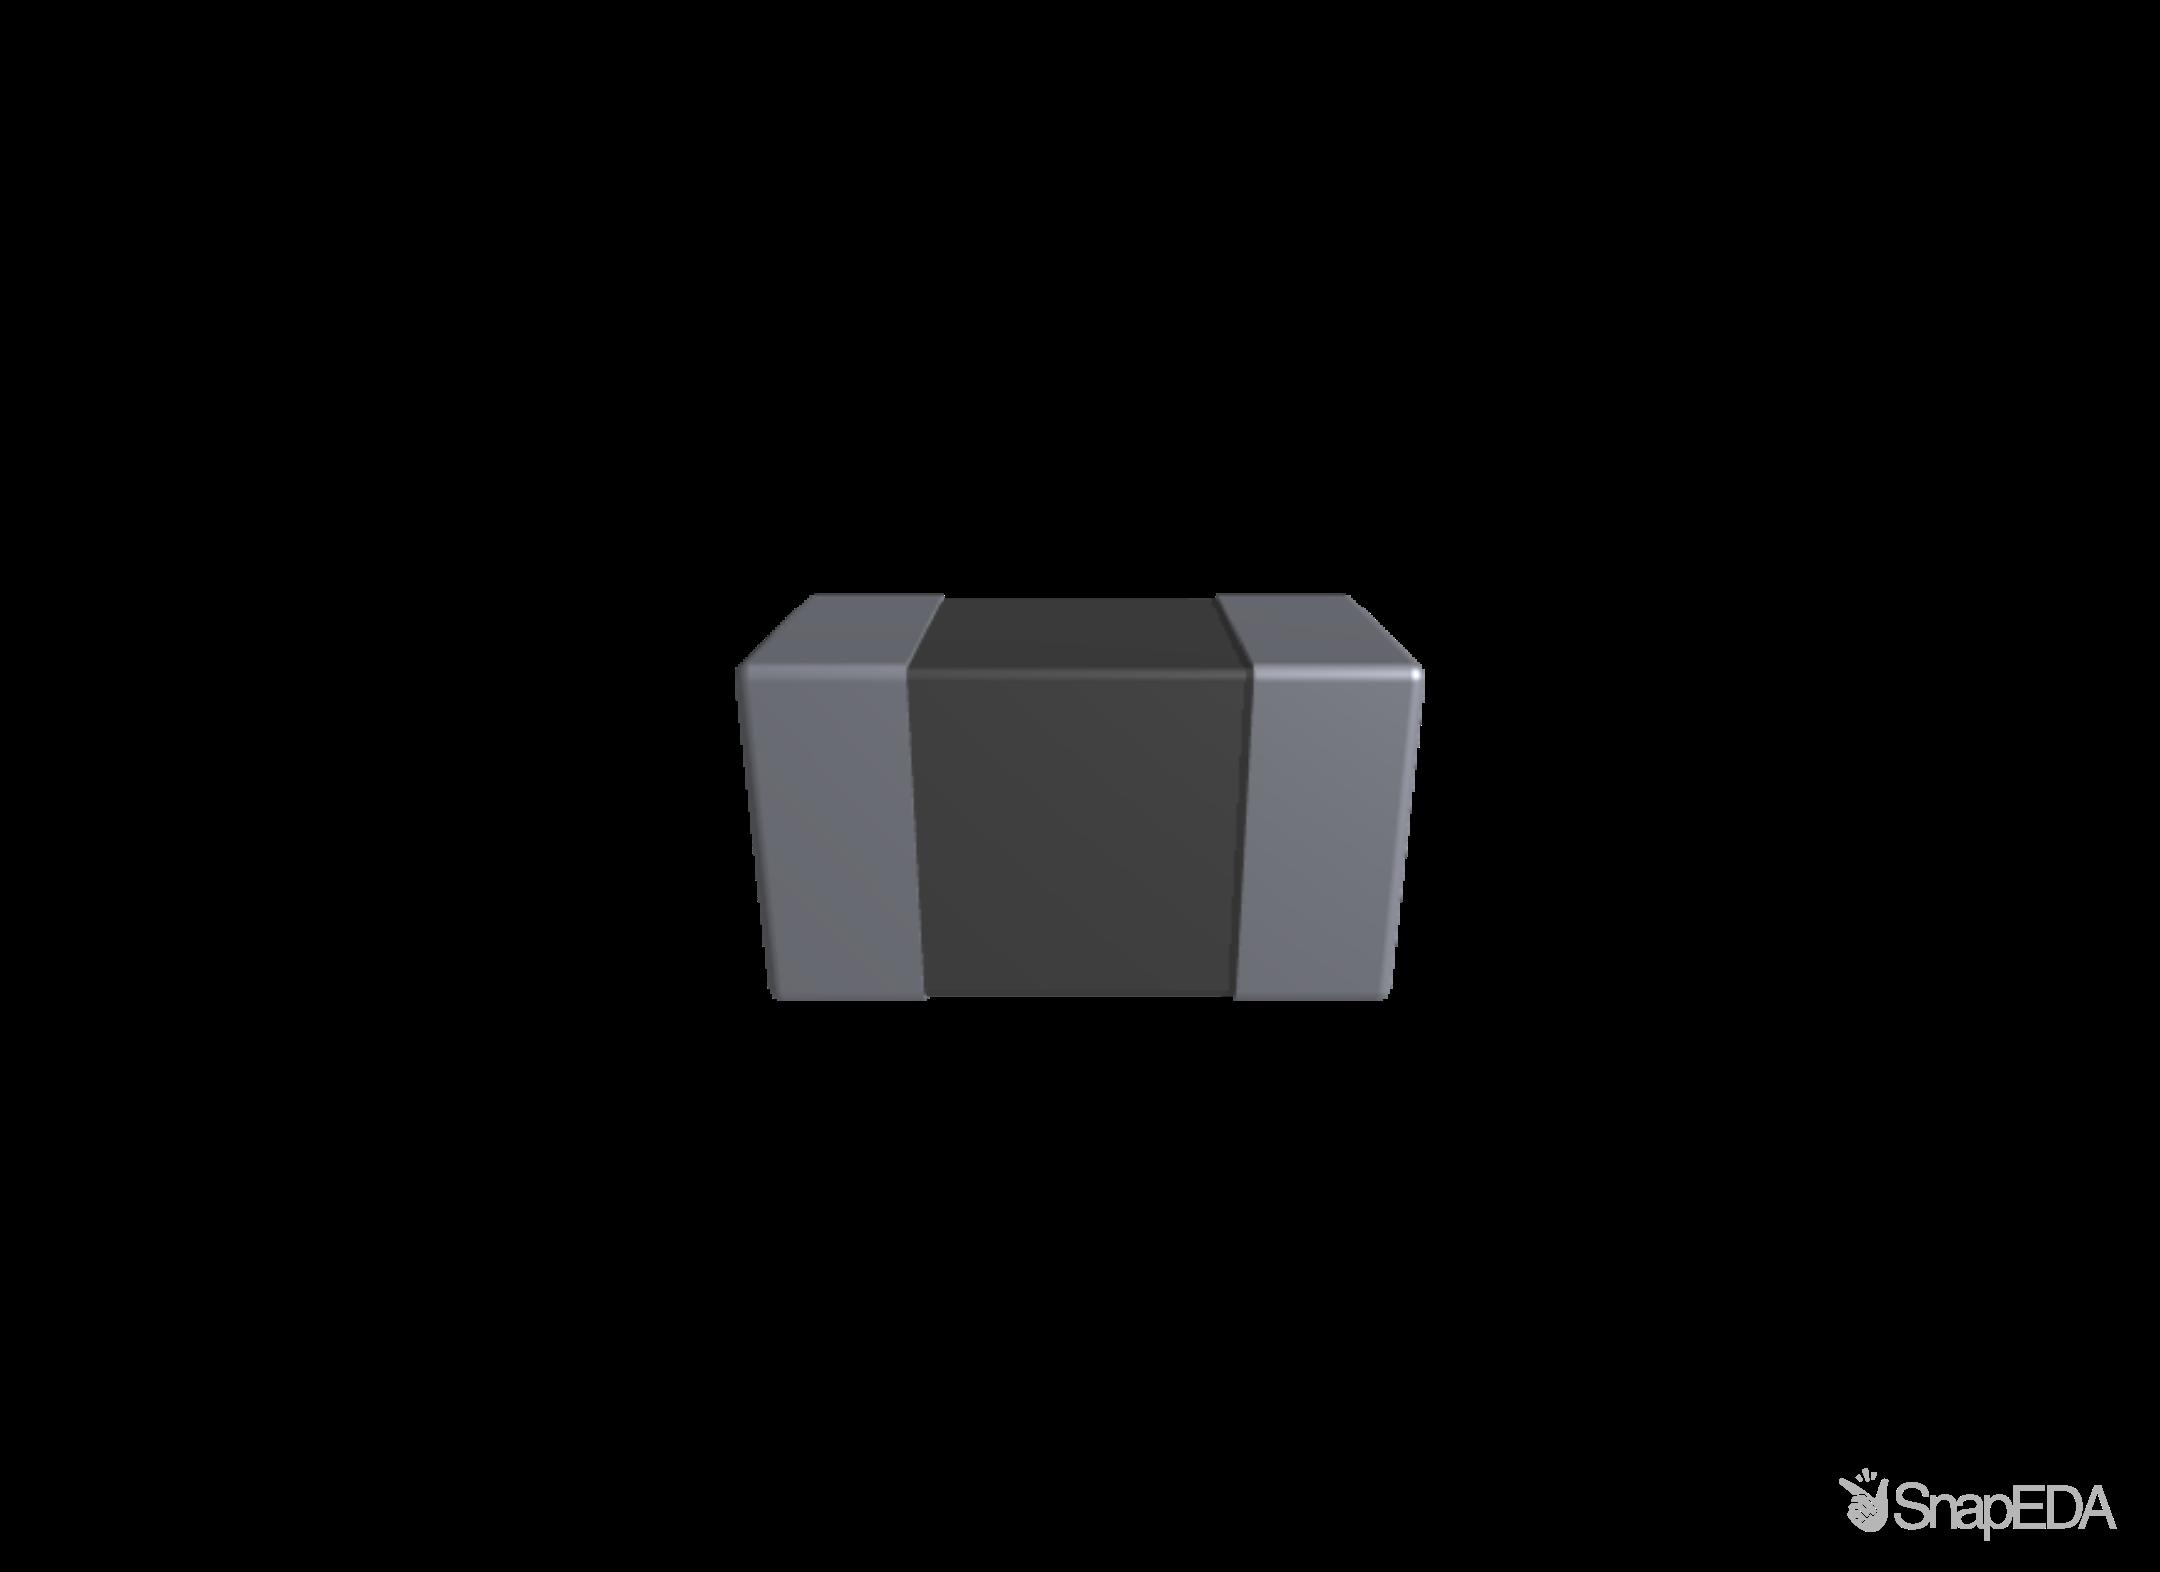 CC0603KRNPO9BN271 3D Model